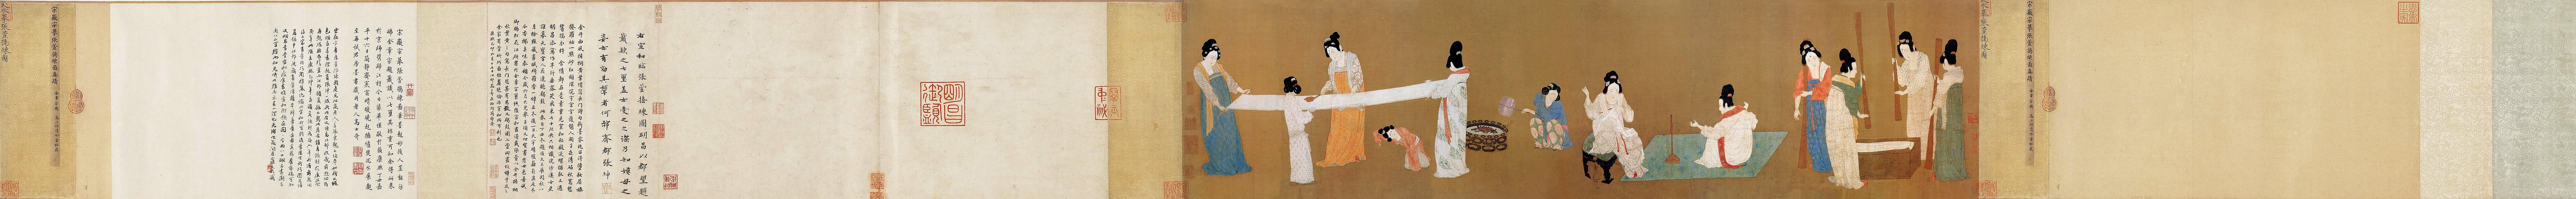 zhang xuan - image 3